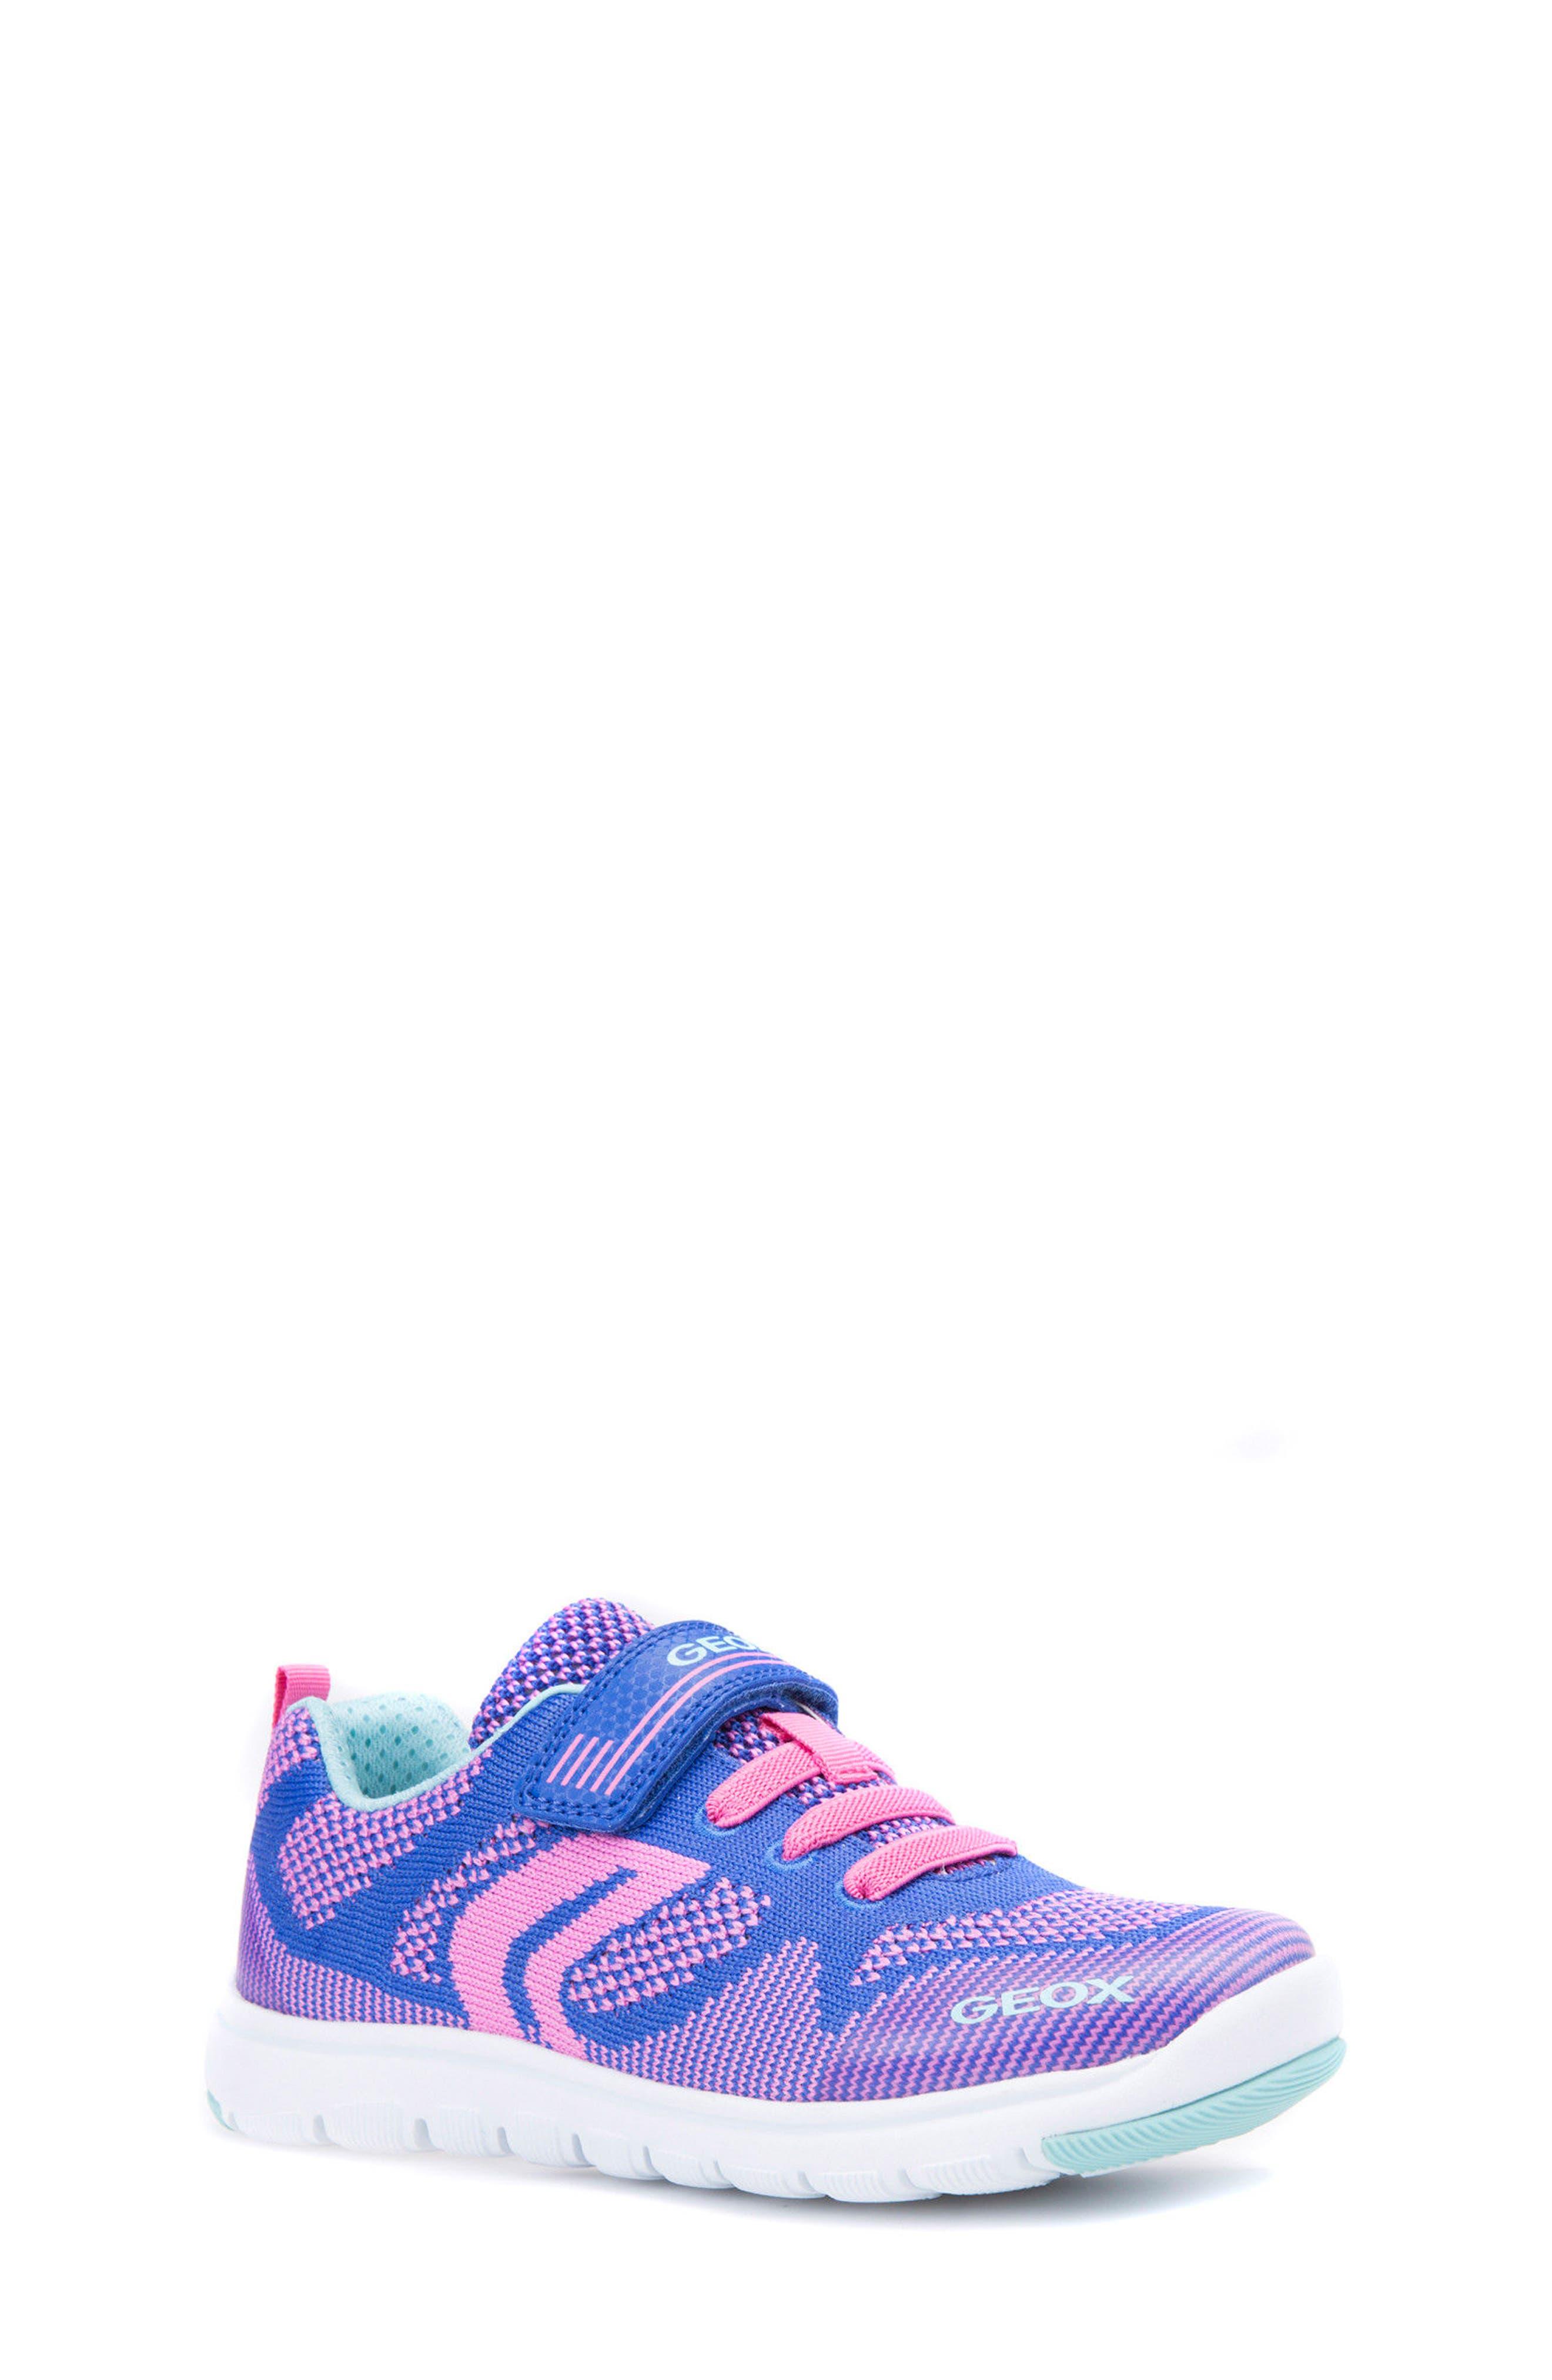 Xunday Low Top Woven Sneaker,                             Main thumbnail 2, color,